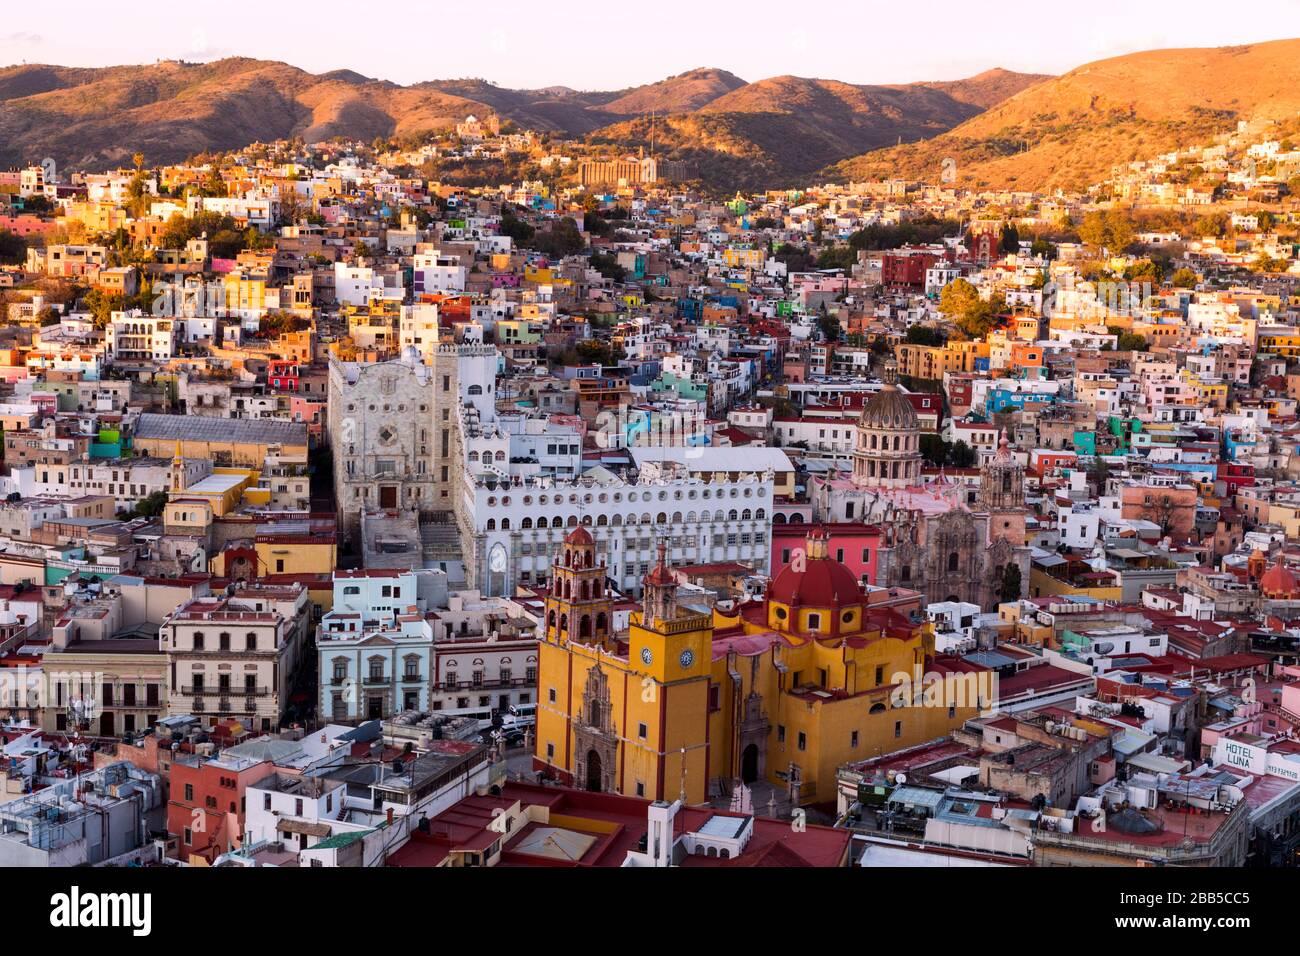 Mexico, Guanajuato skyline as viewed from Monumento a El Pïpila. Guanajuato, a UNESCO world heritage site Stock Photo